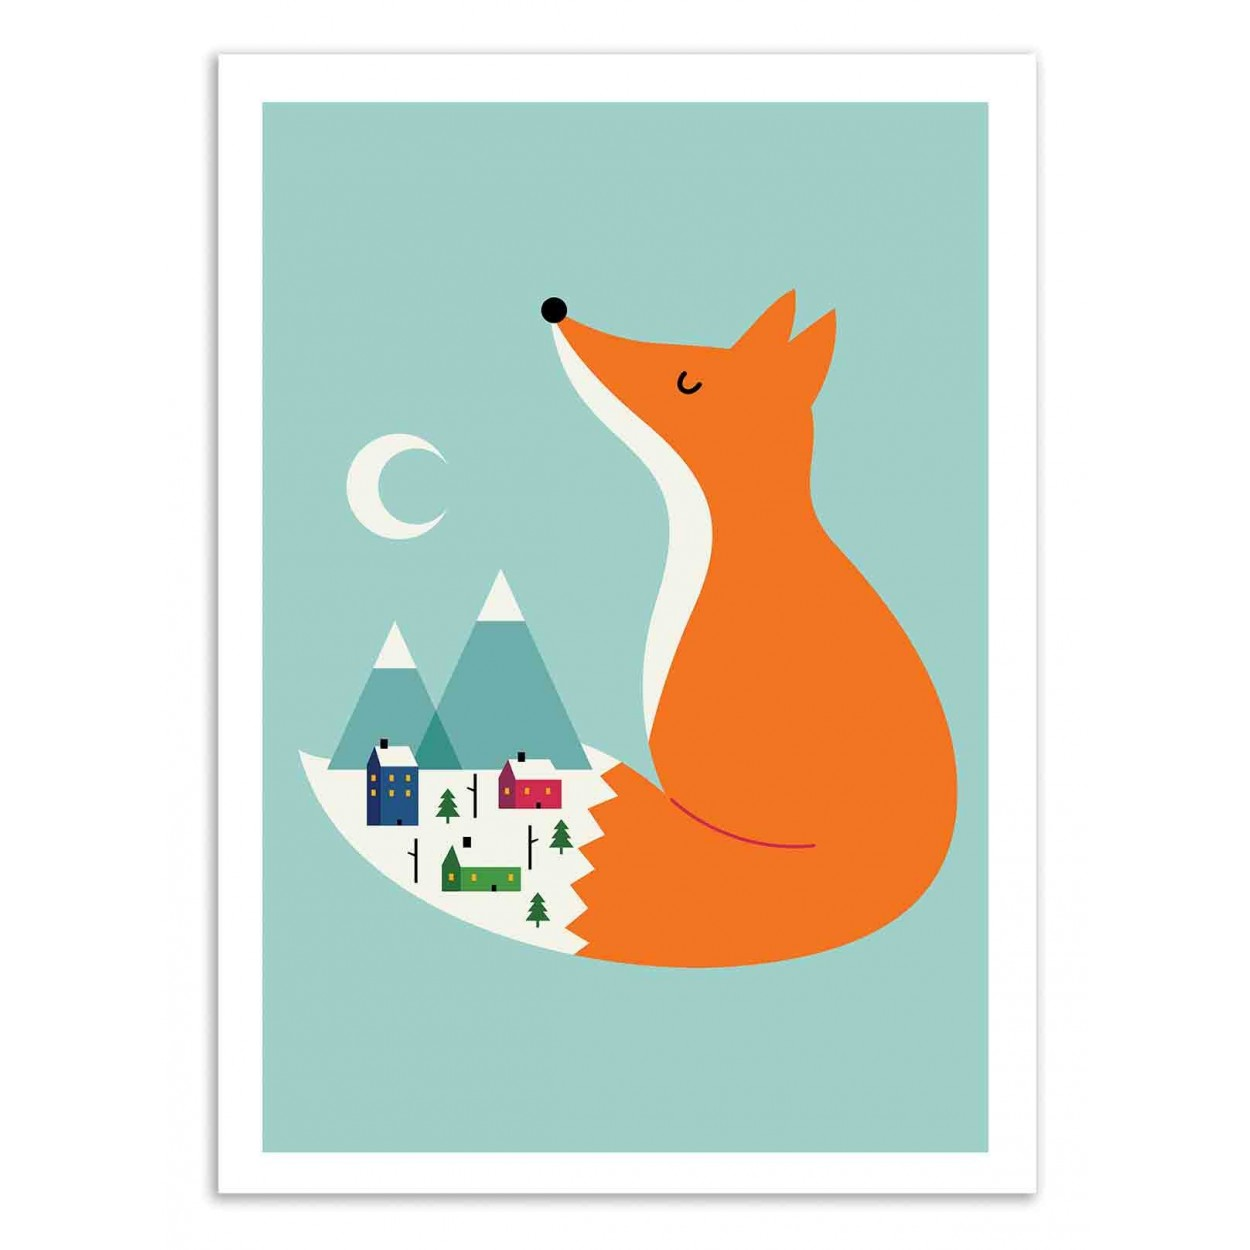 affiche d 39 art et poster illustration dessin d 39 un renard pour bebe. Black Bedroom Furniture Sets. Home Design Ideas